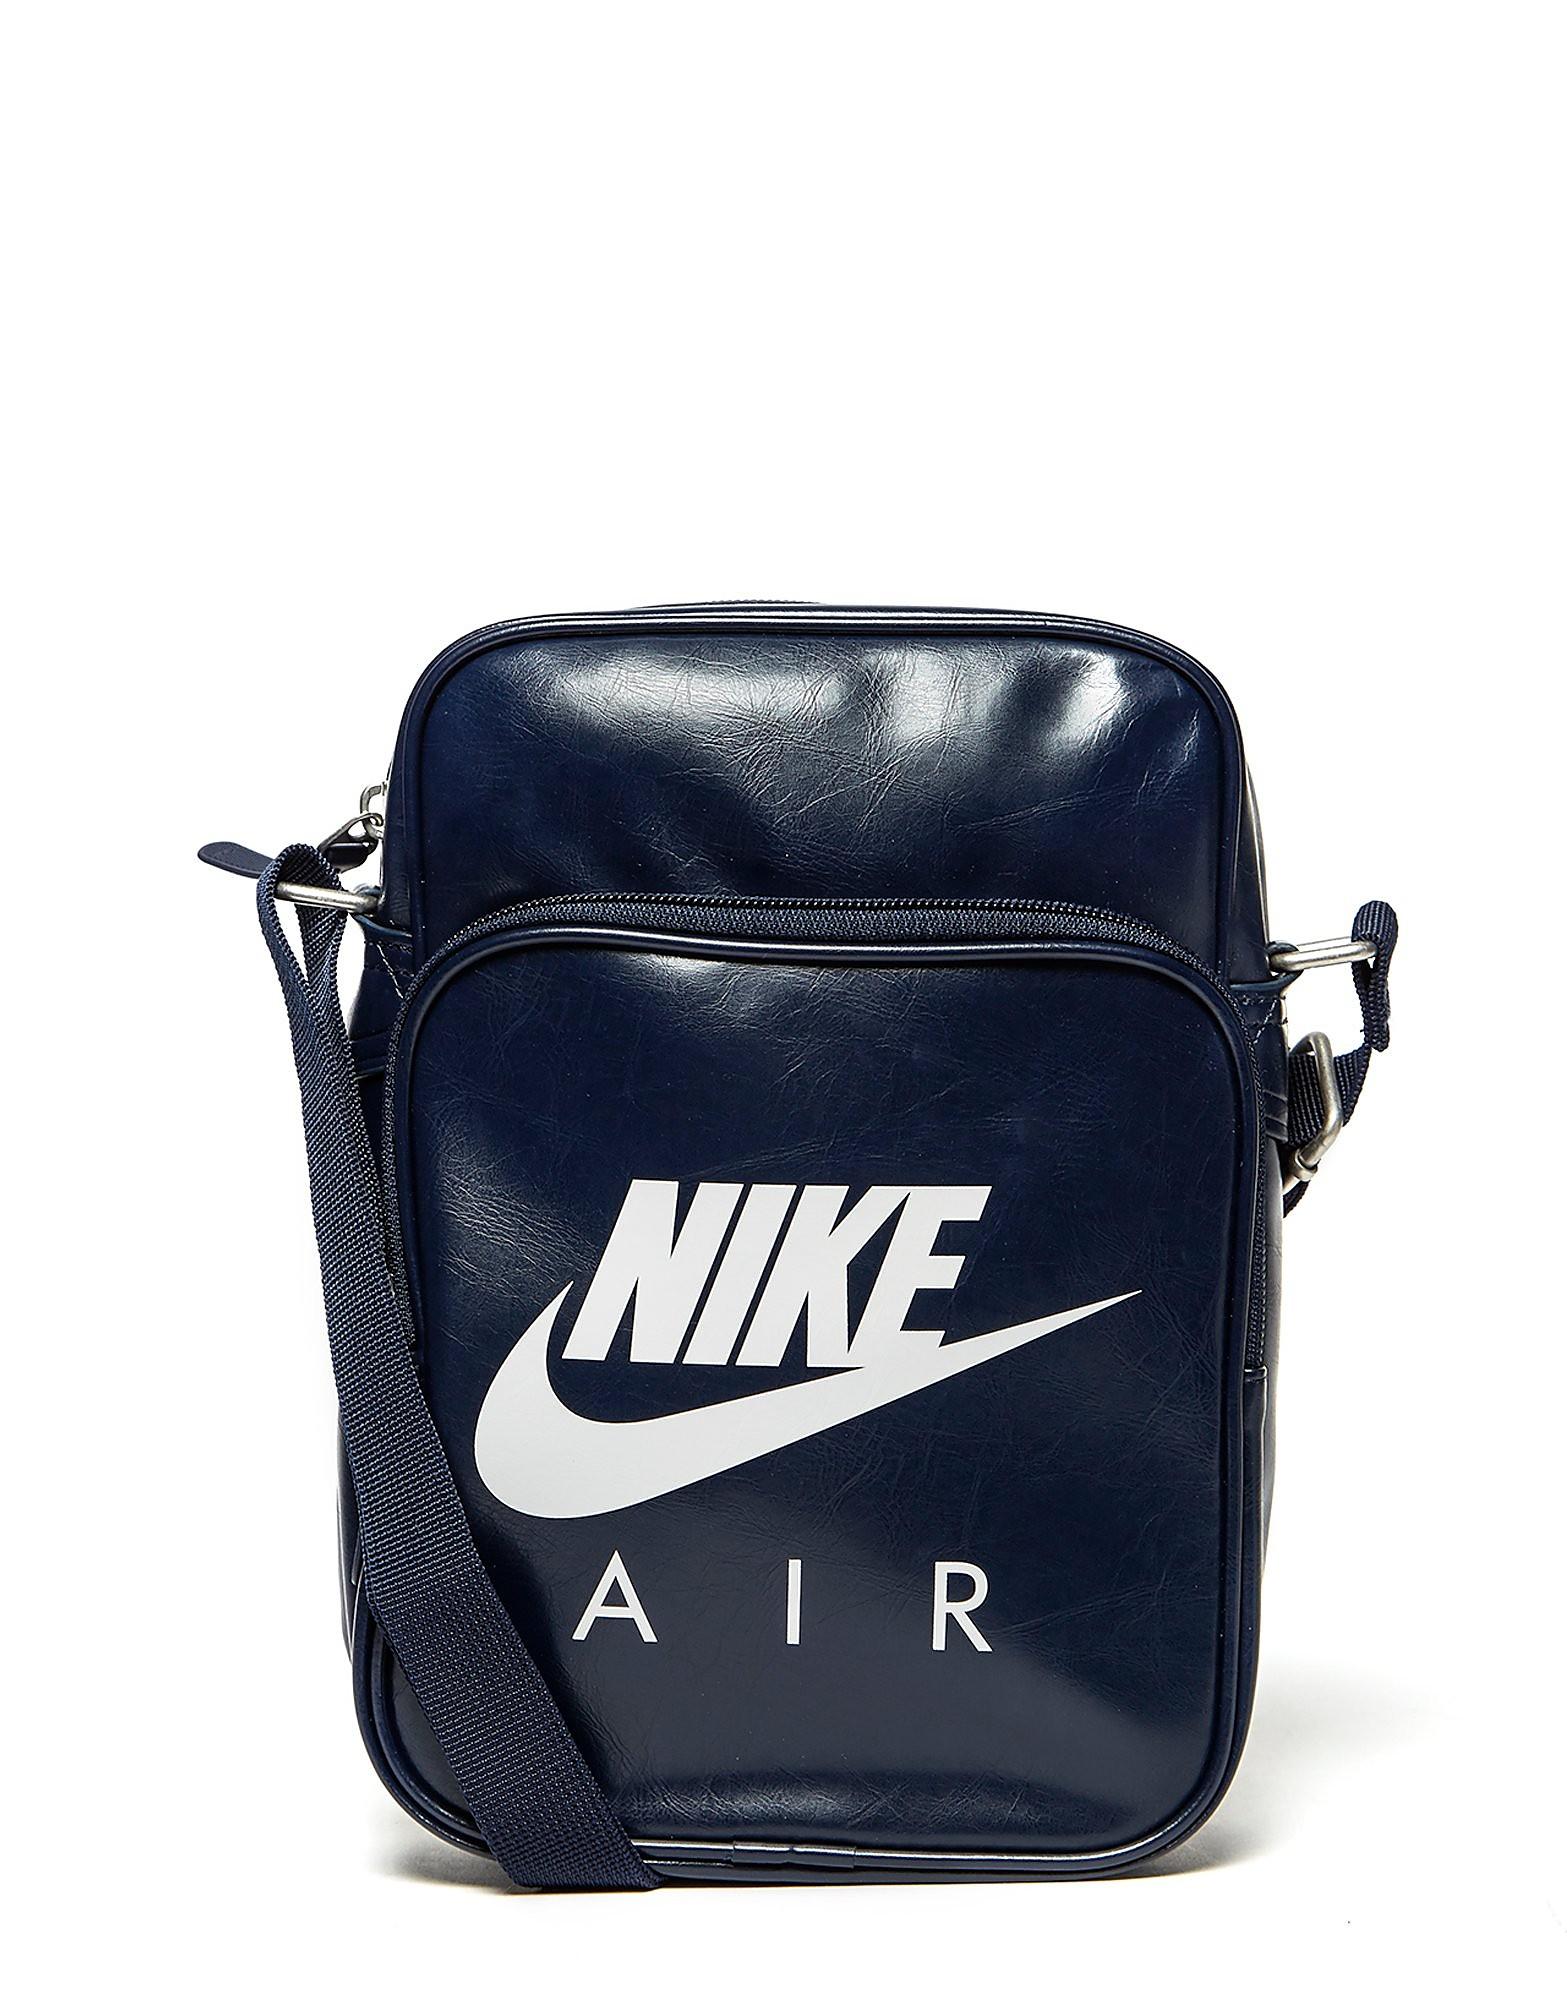 Nike Air Small Items Bag